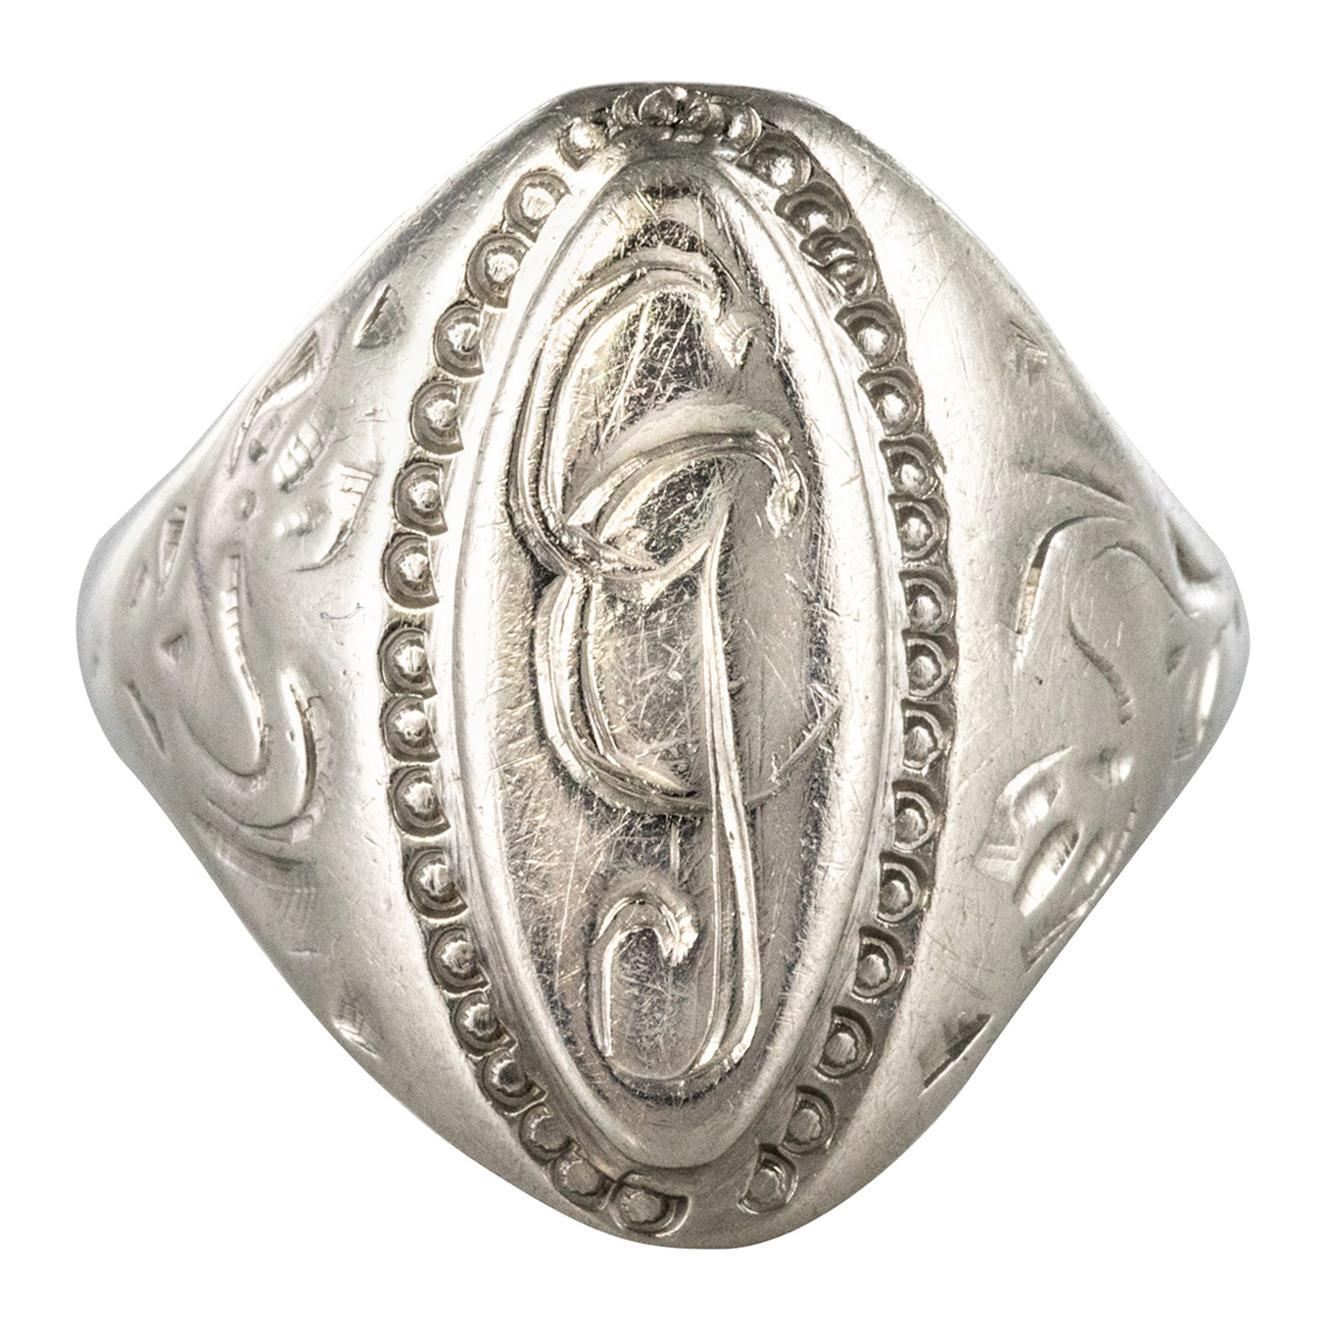 19th Century Antique Silver Unisex Signet Ring